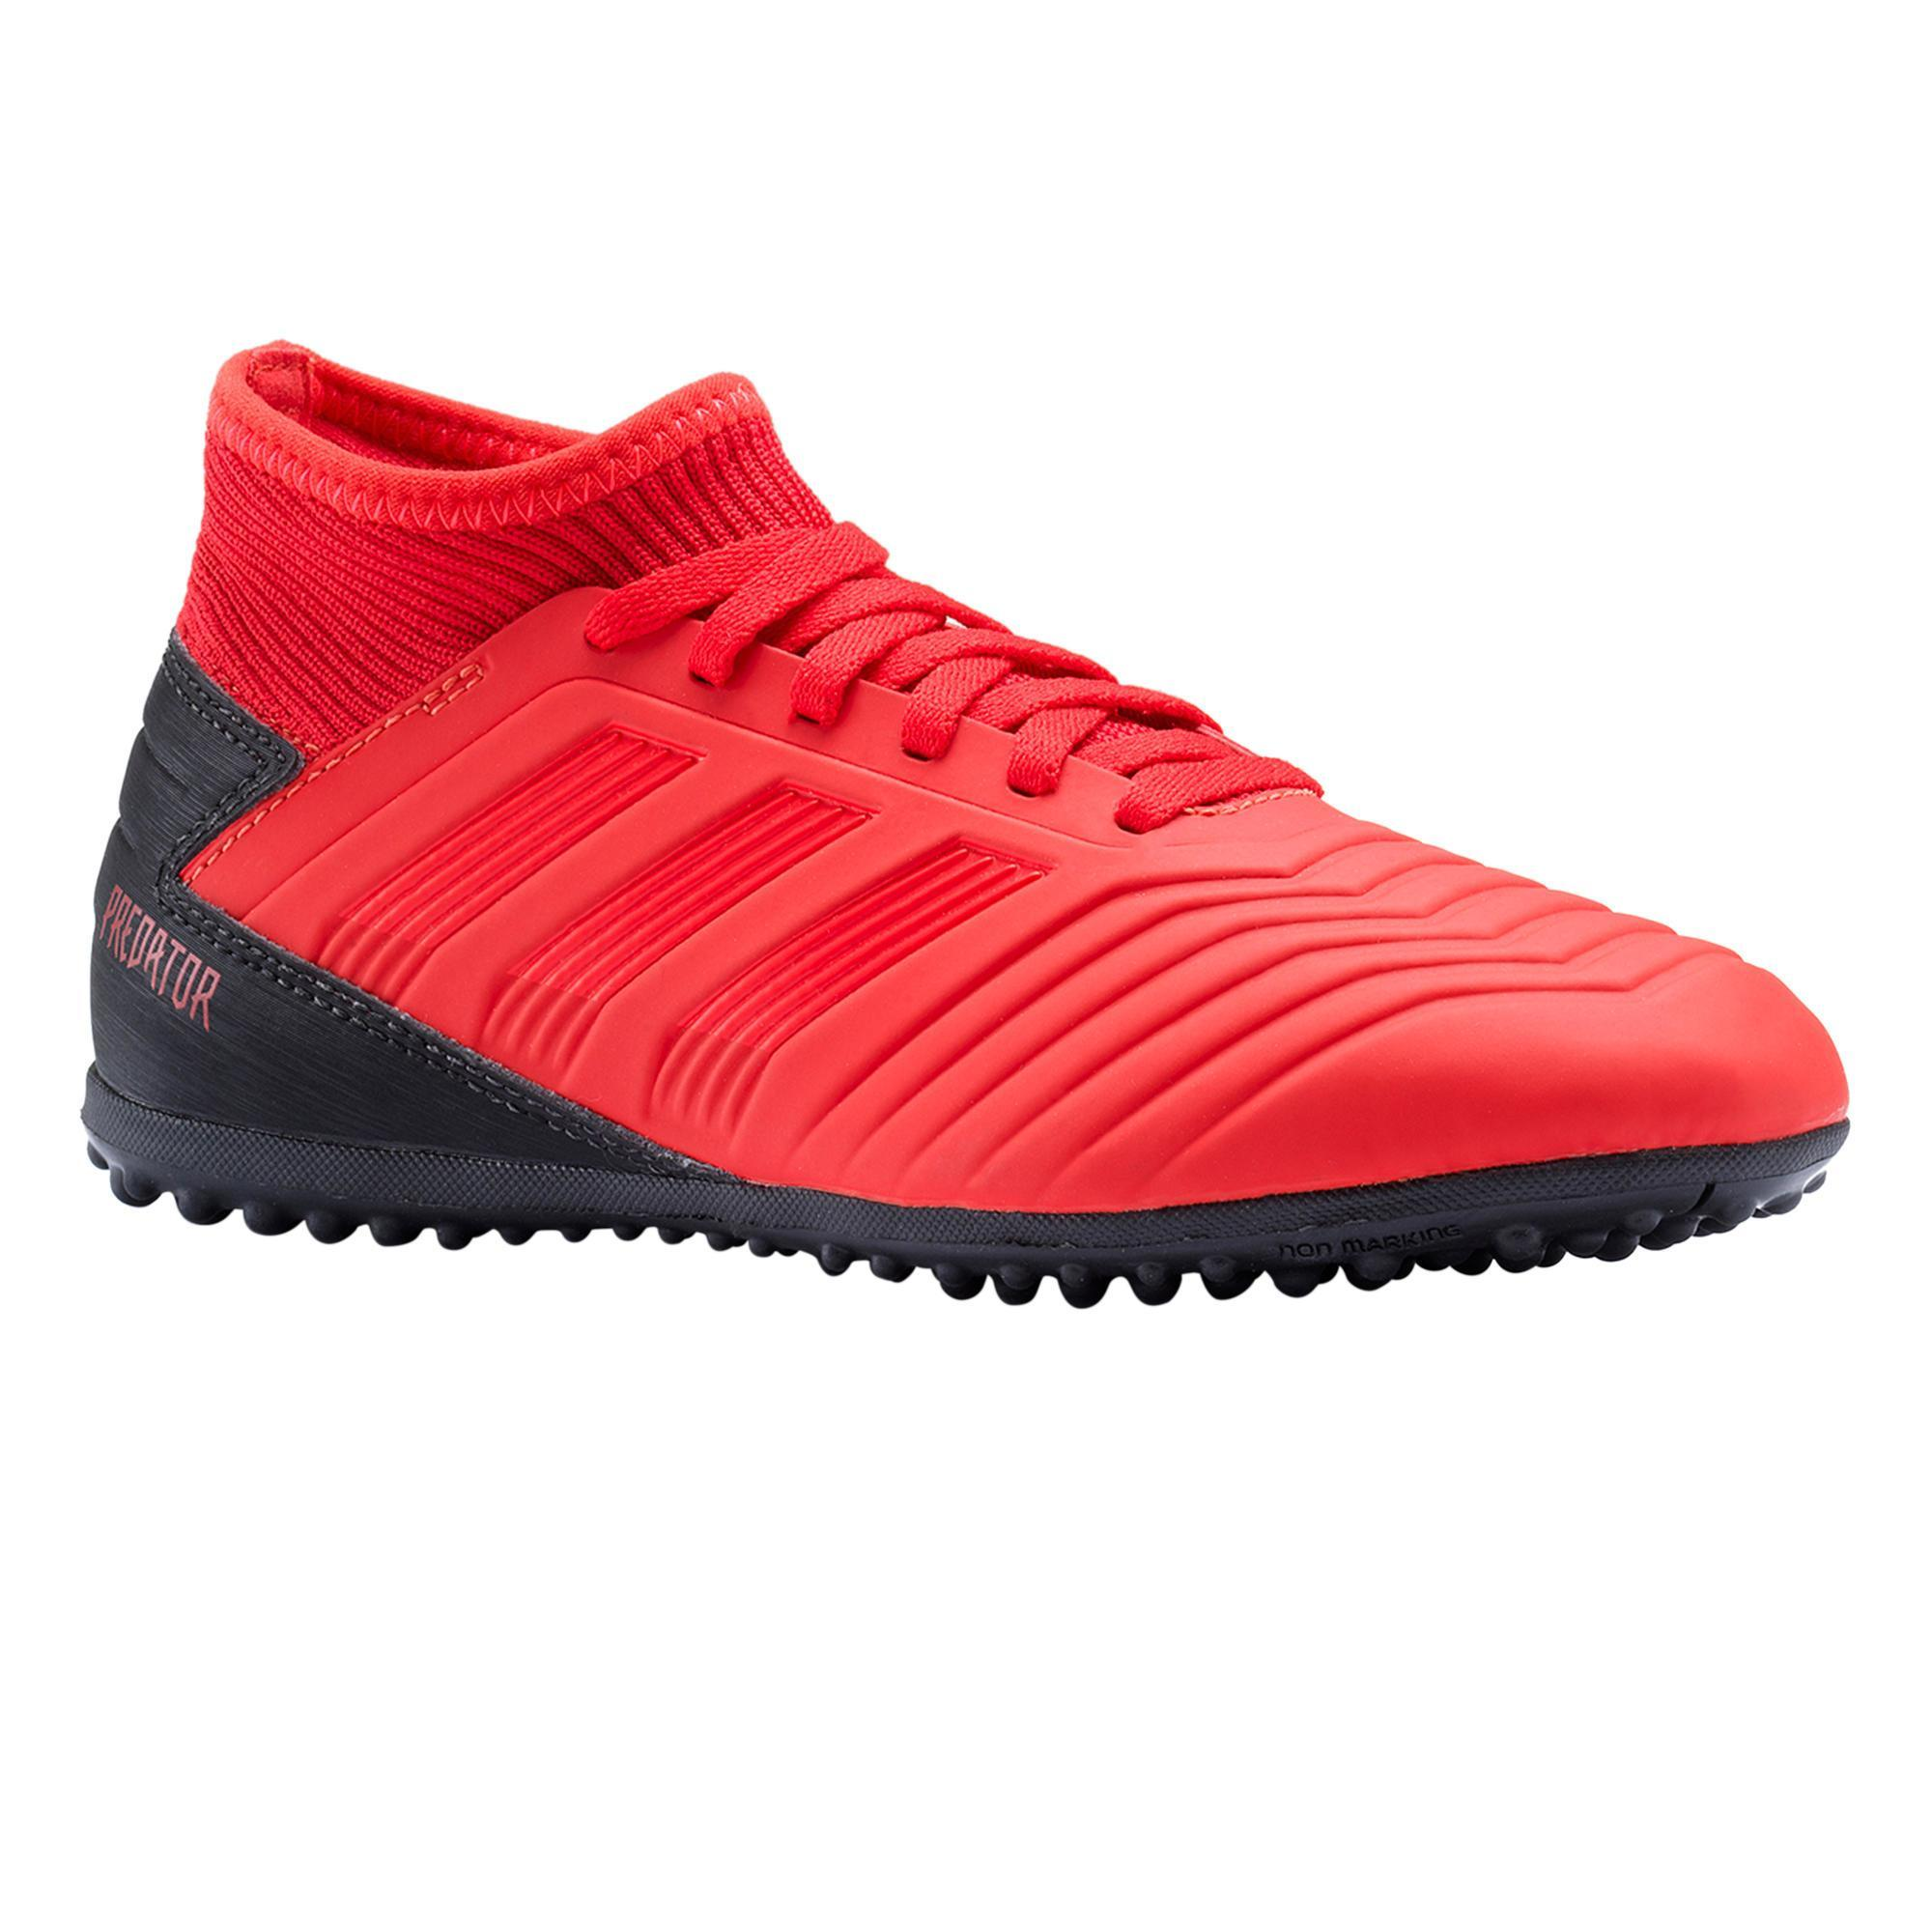 2c3d0a59e77 Adidas | Decathlon